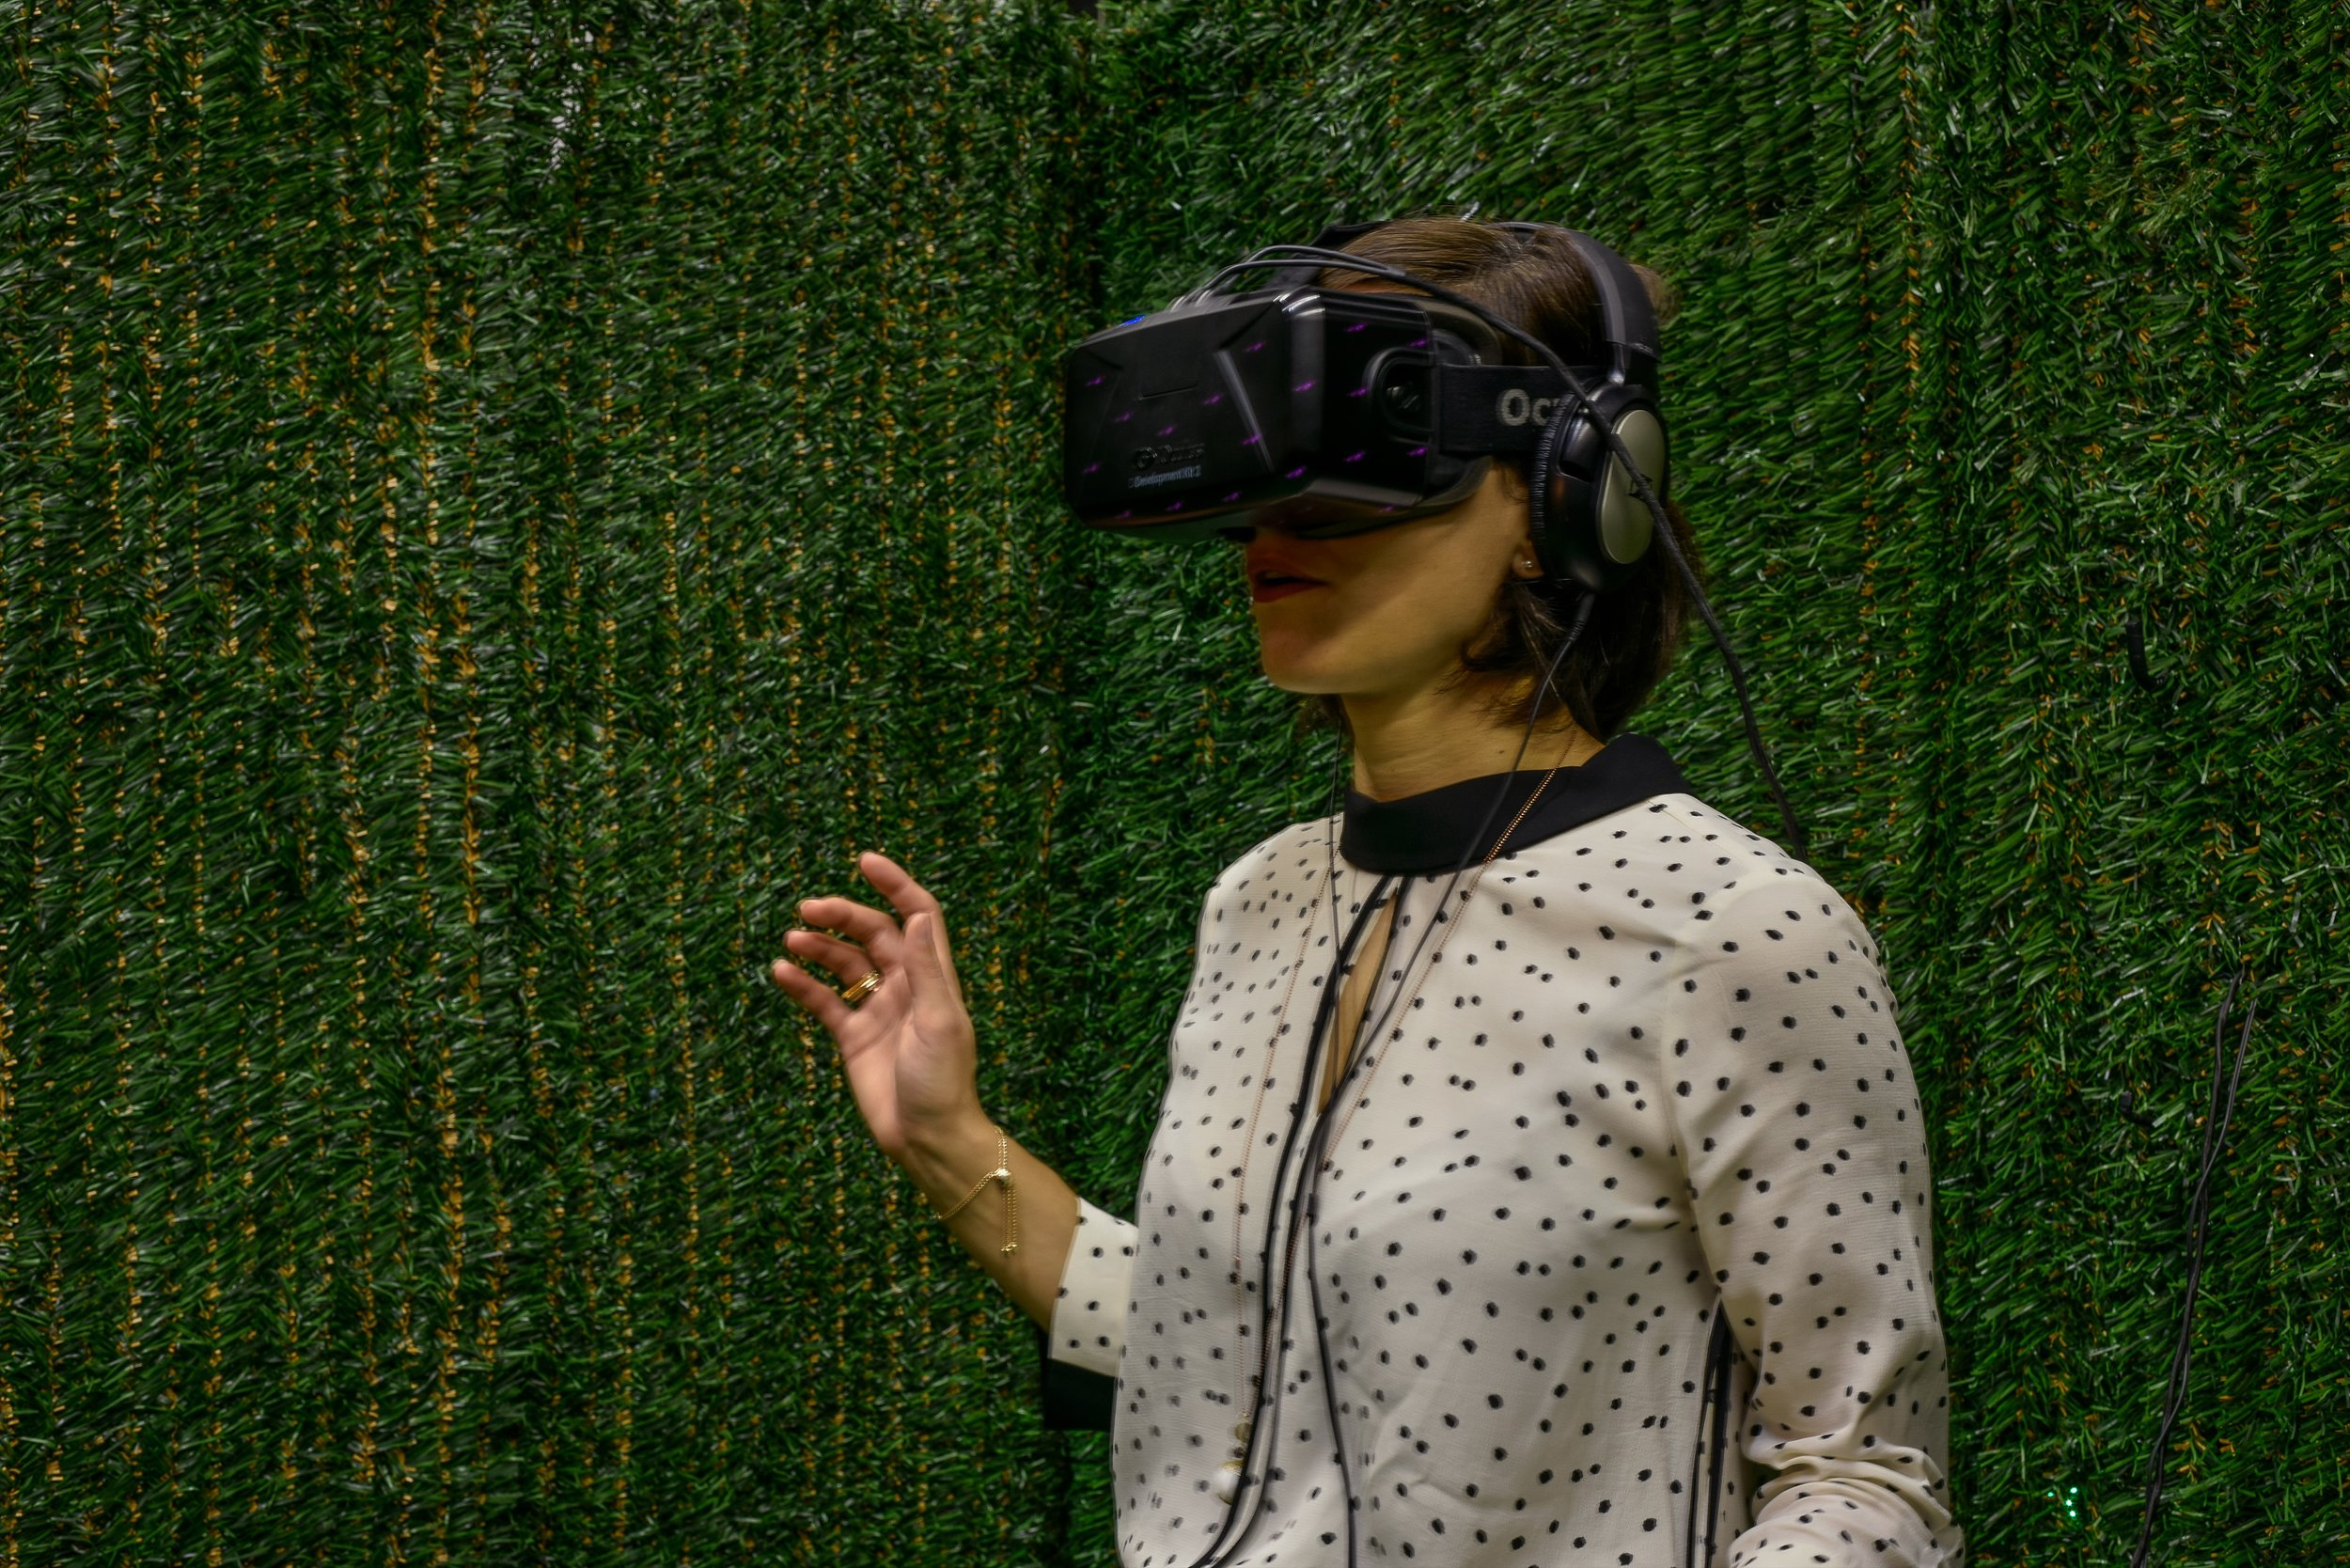 Sculpture Garden, Hedgemaze  —  VR Installation Zabludowicz Collection, London  2016  Client  —  Jon Rafman Studios